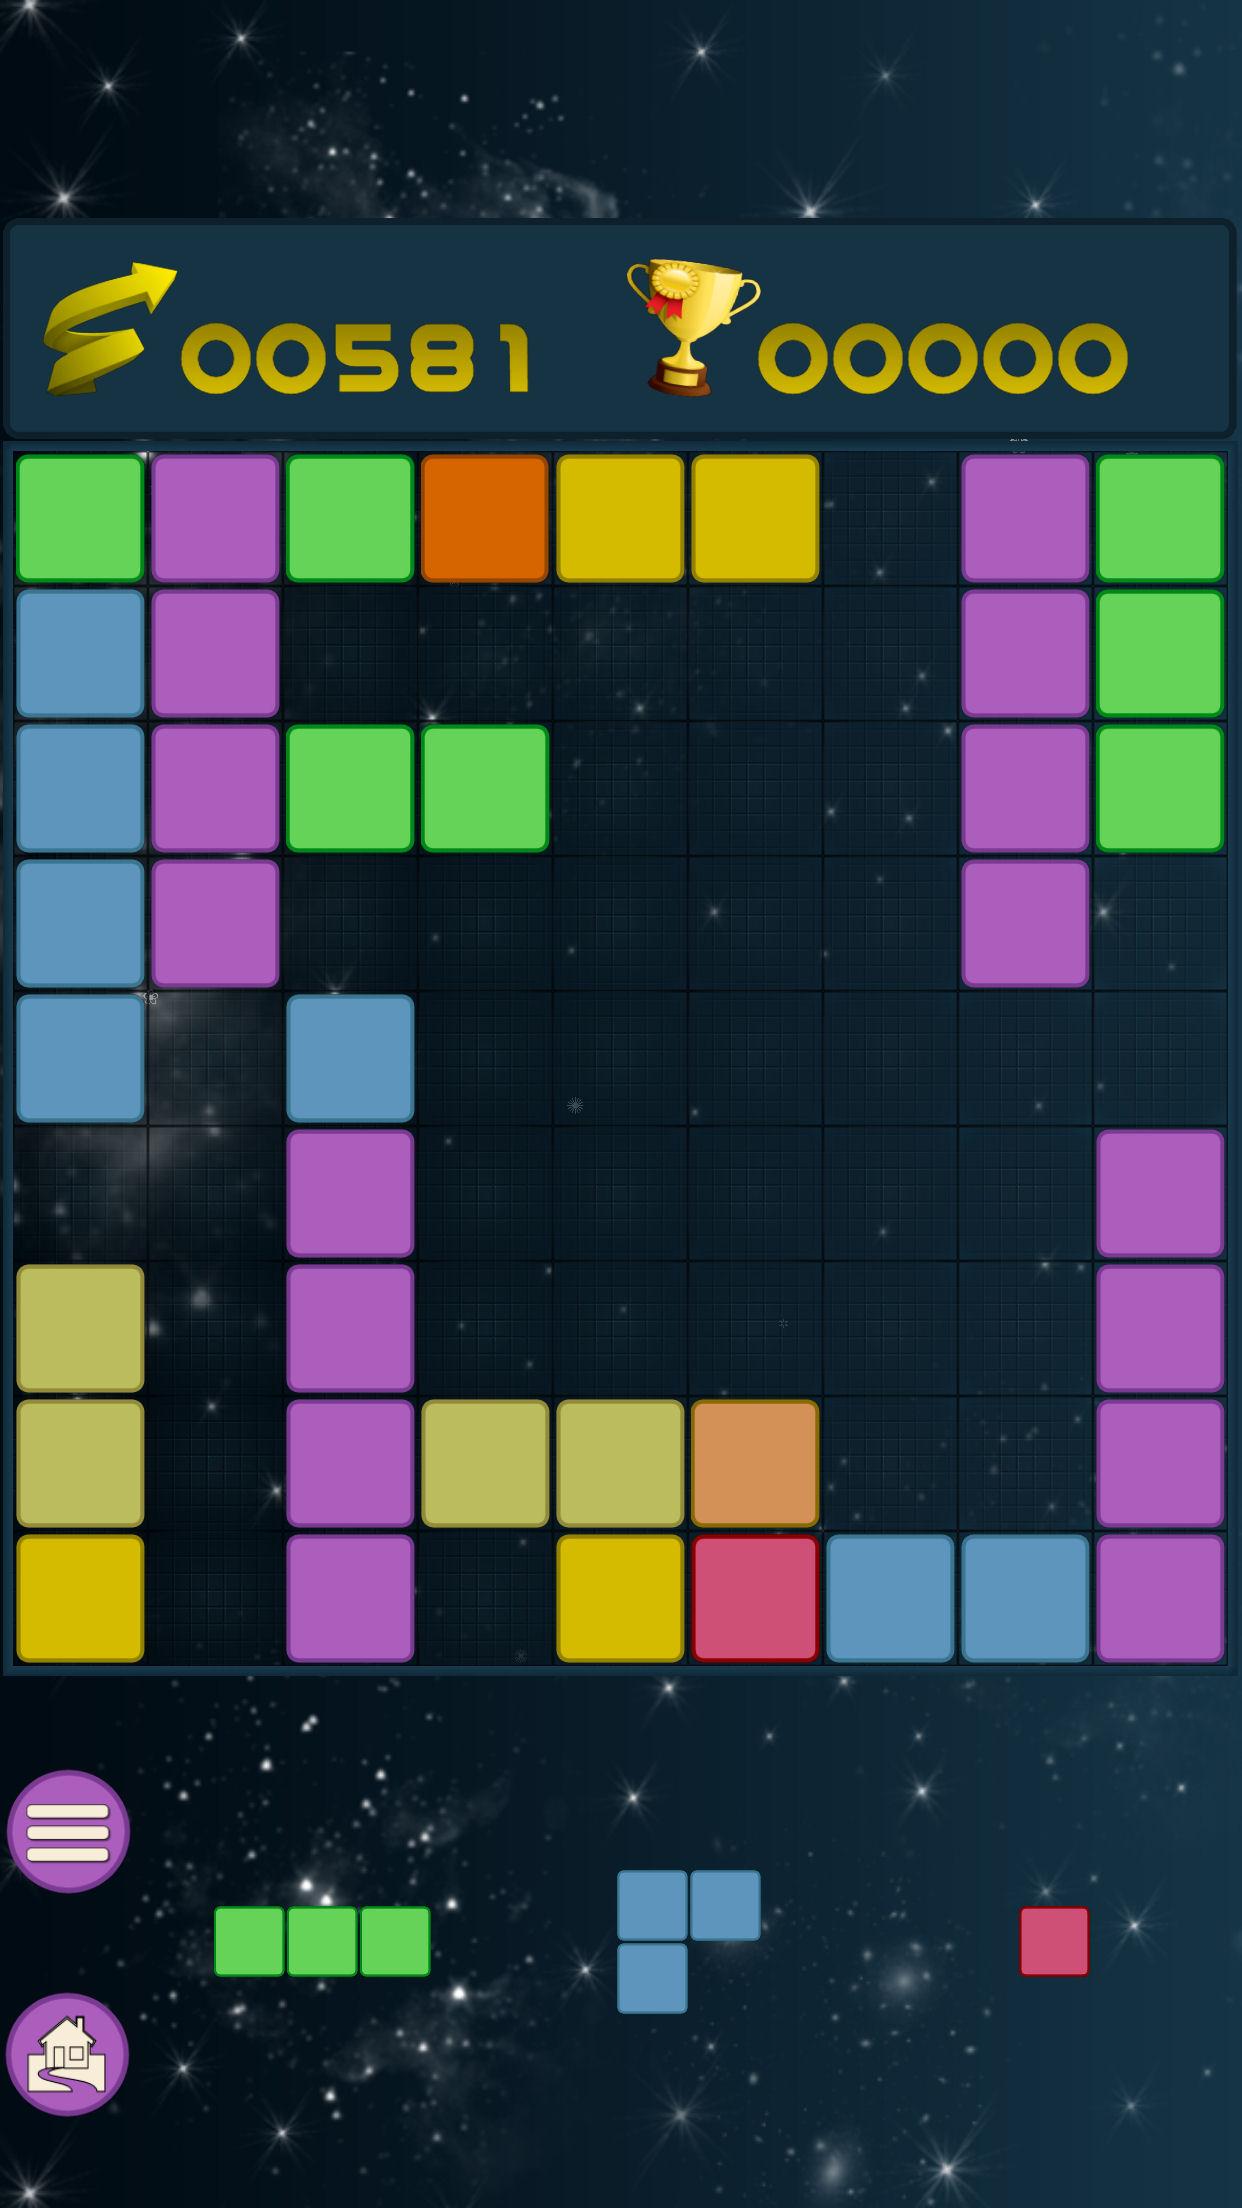 Blokz_Brd11_720x1280